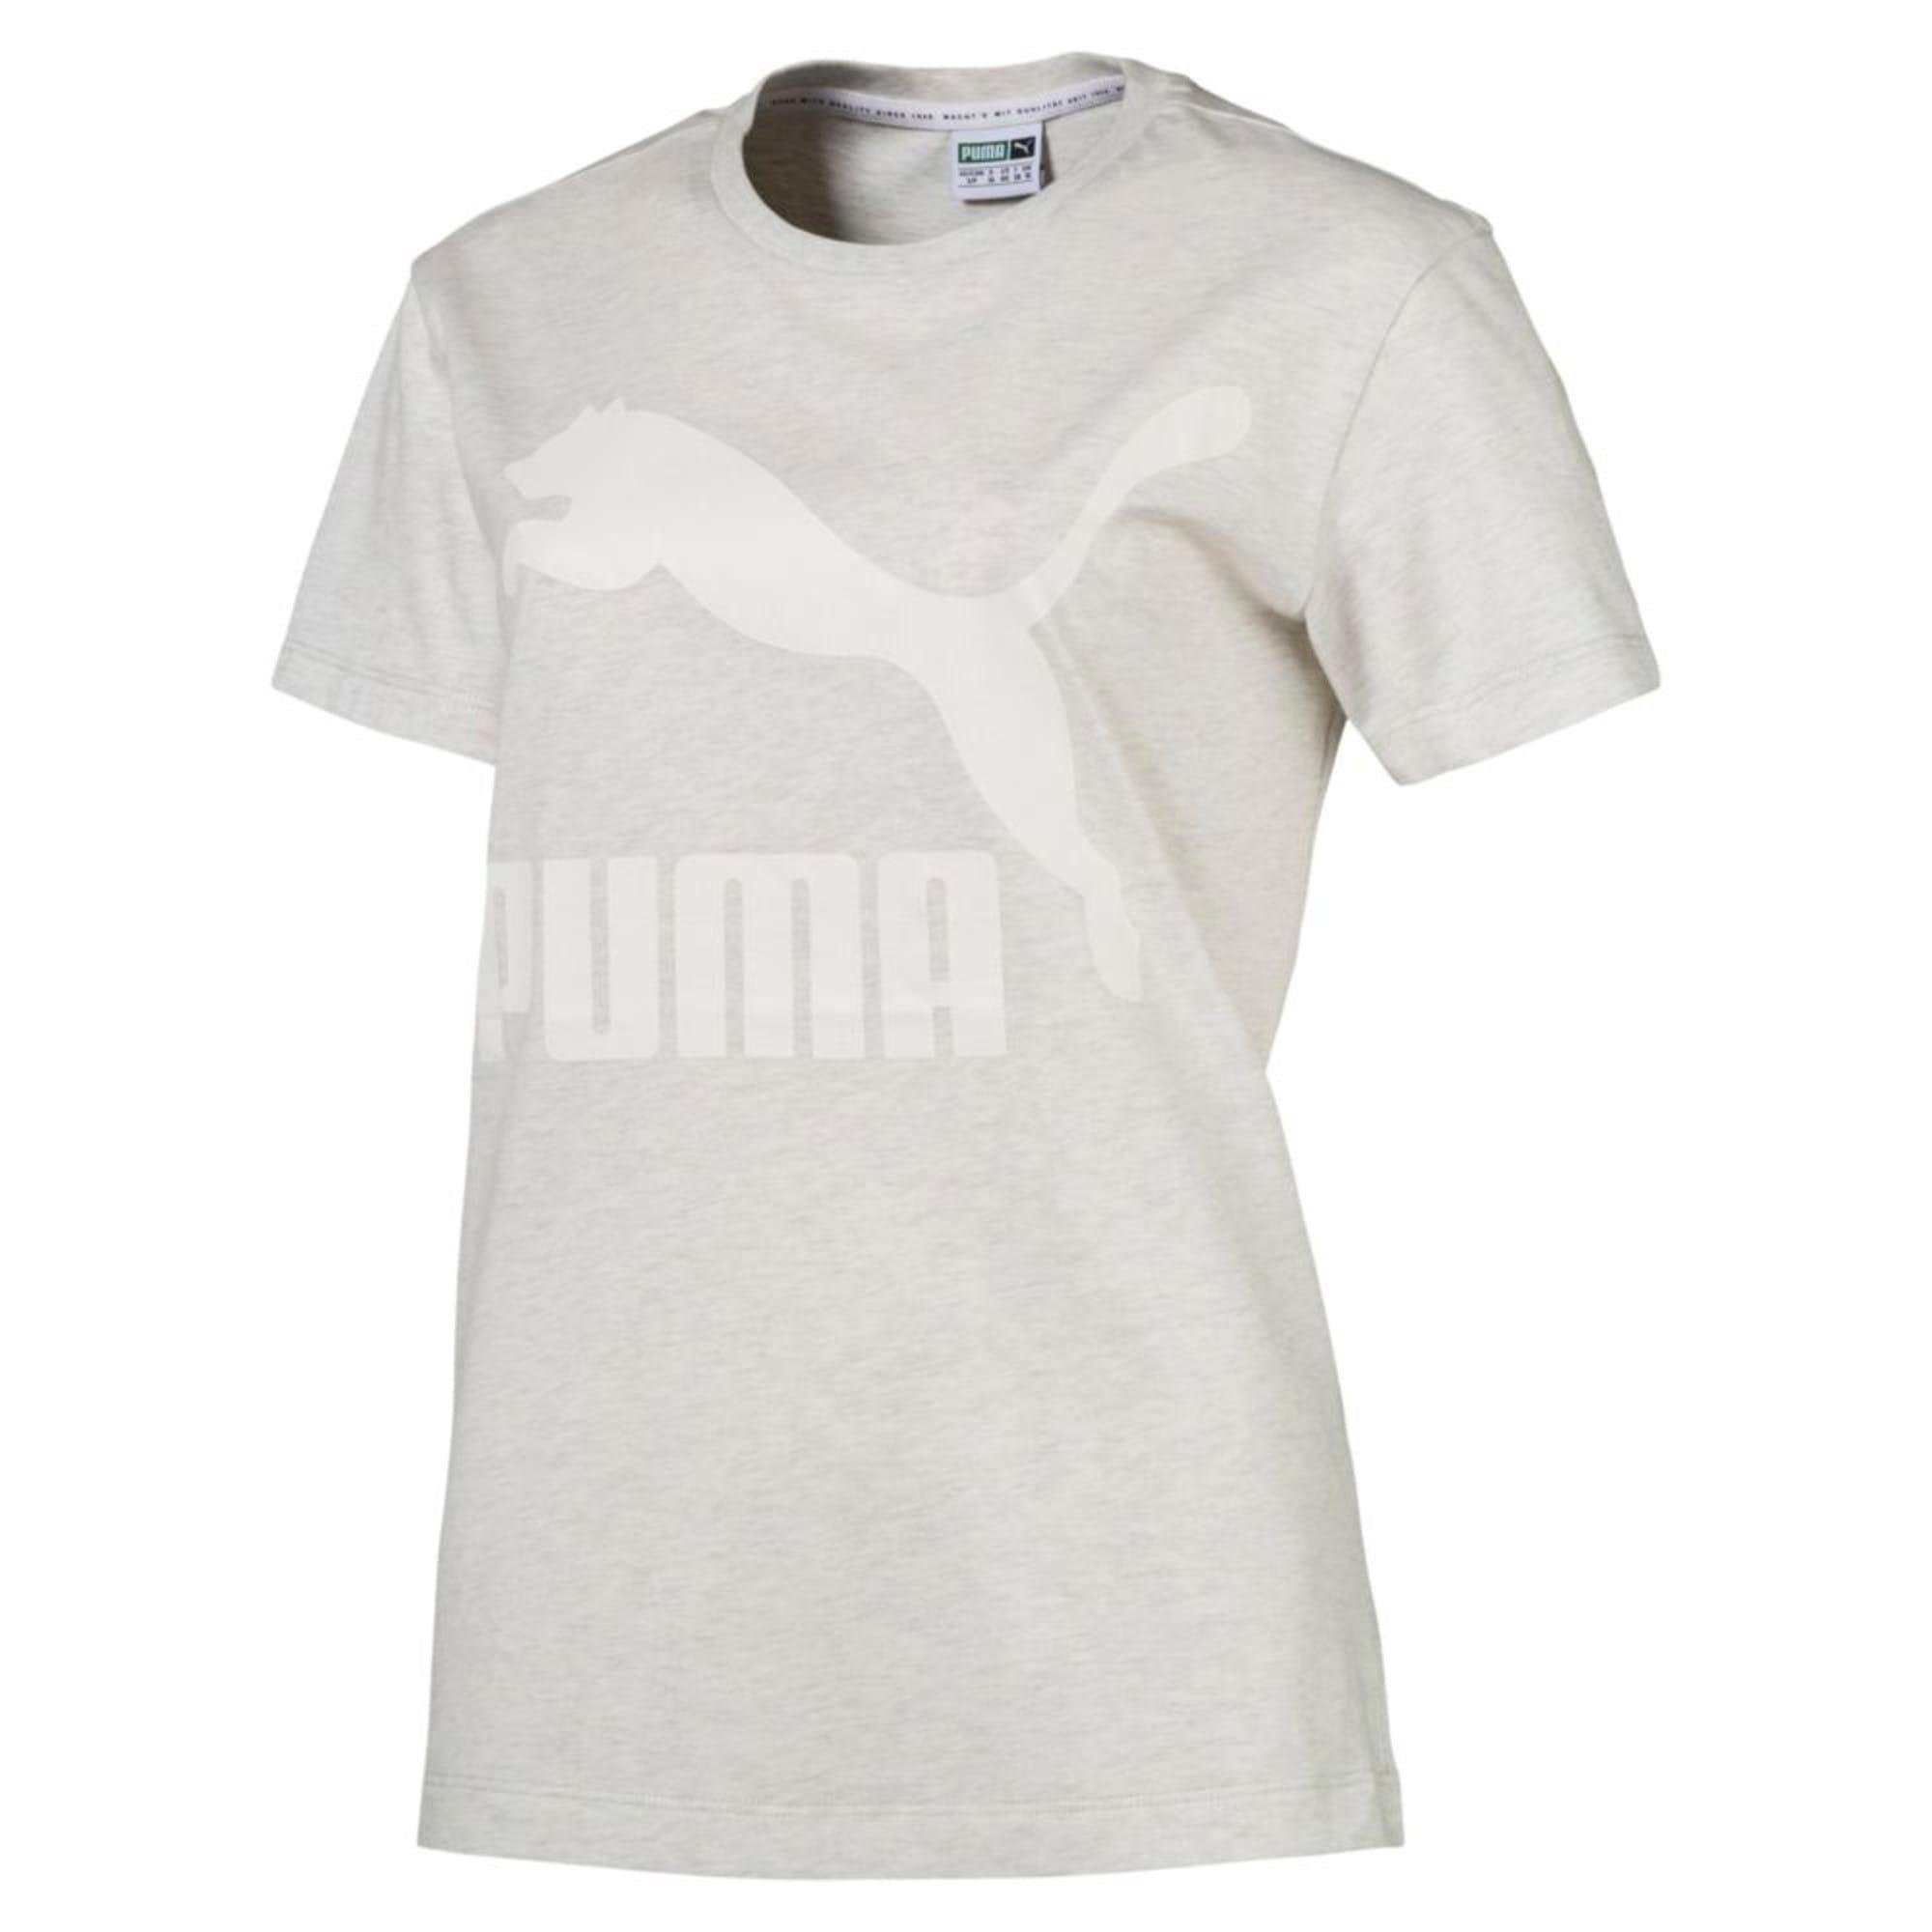 Thumbnail 4 of Classics Logo Women's T-Shirt, Puma White Heather-B1004, medium-IND